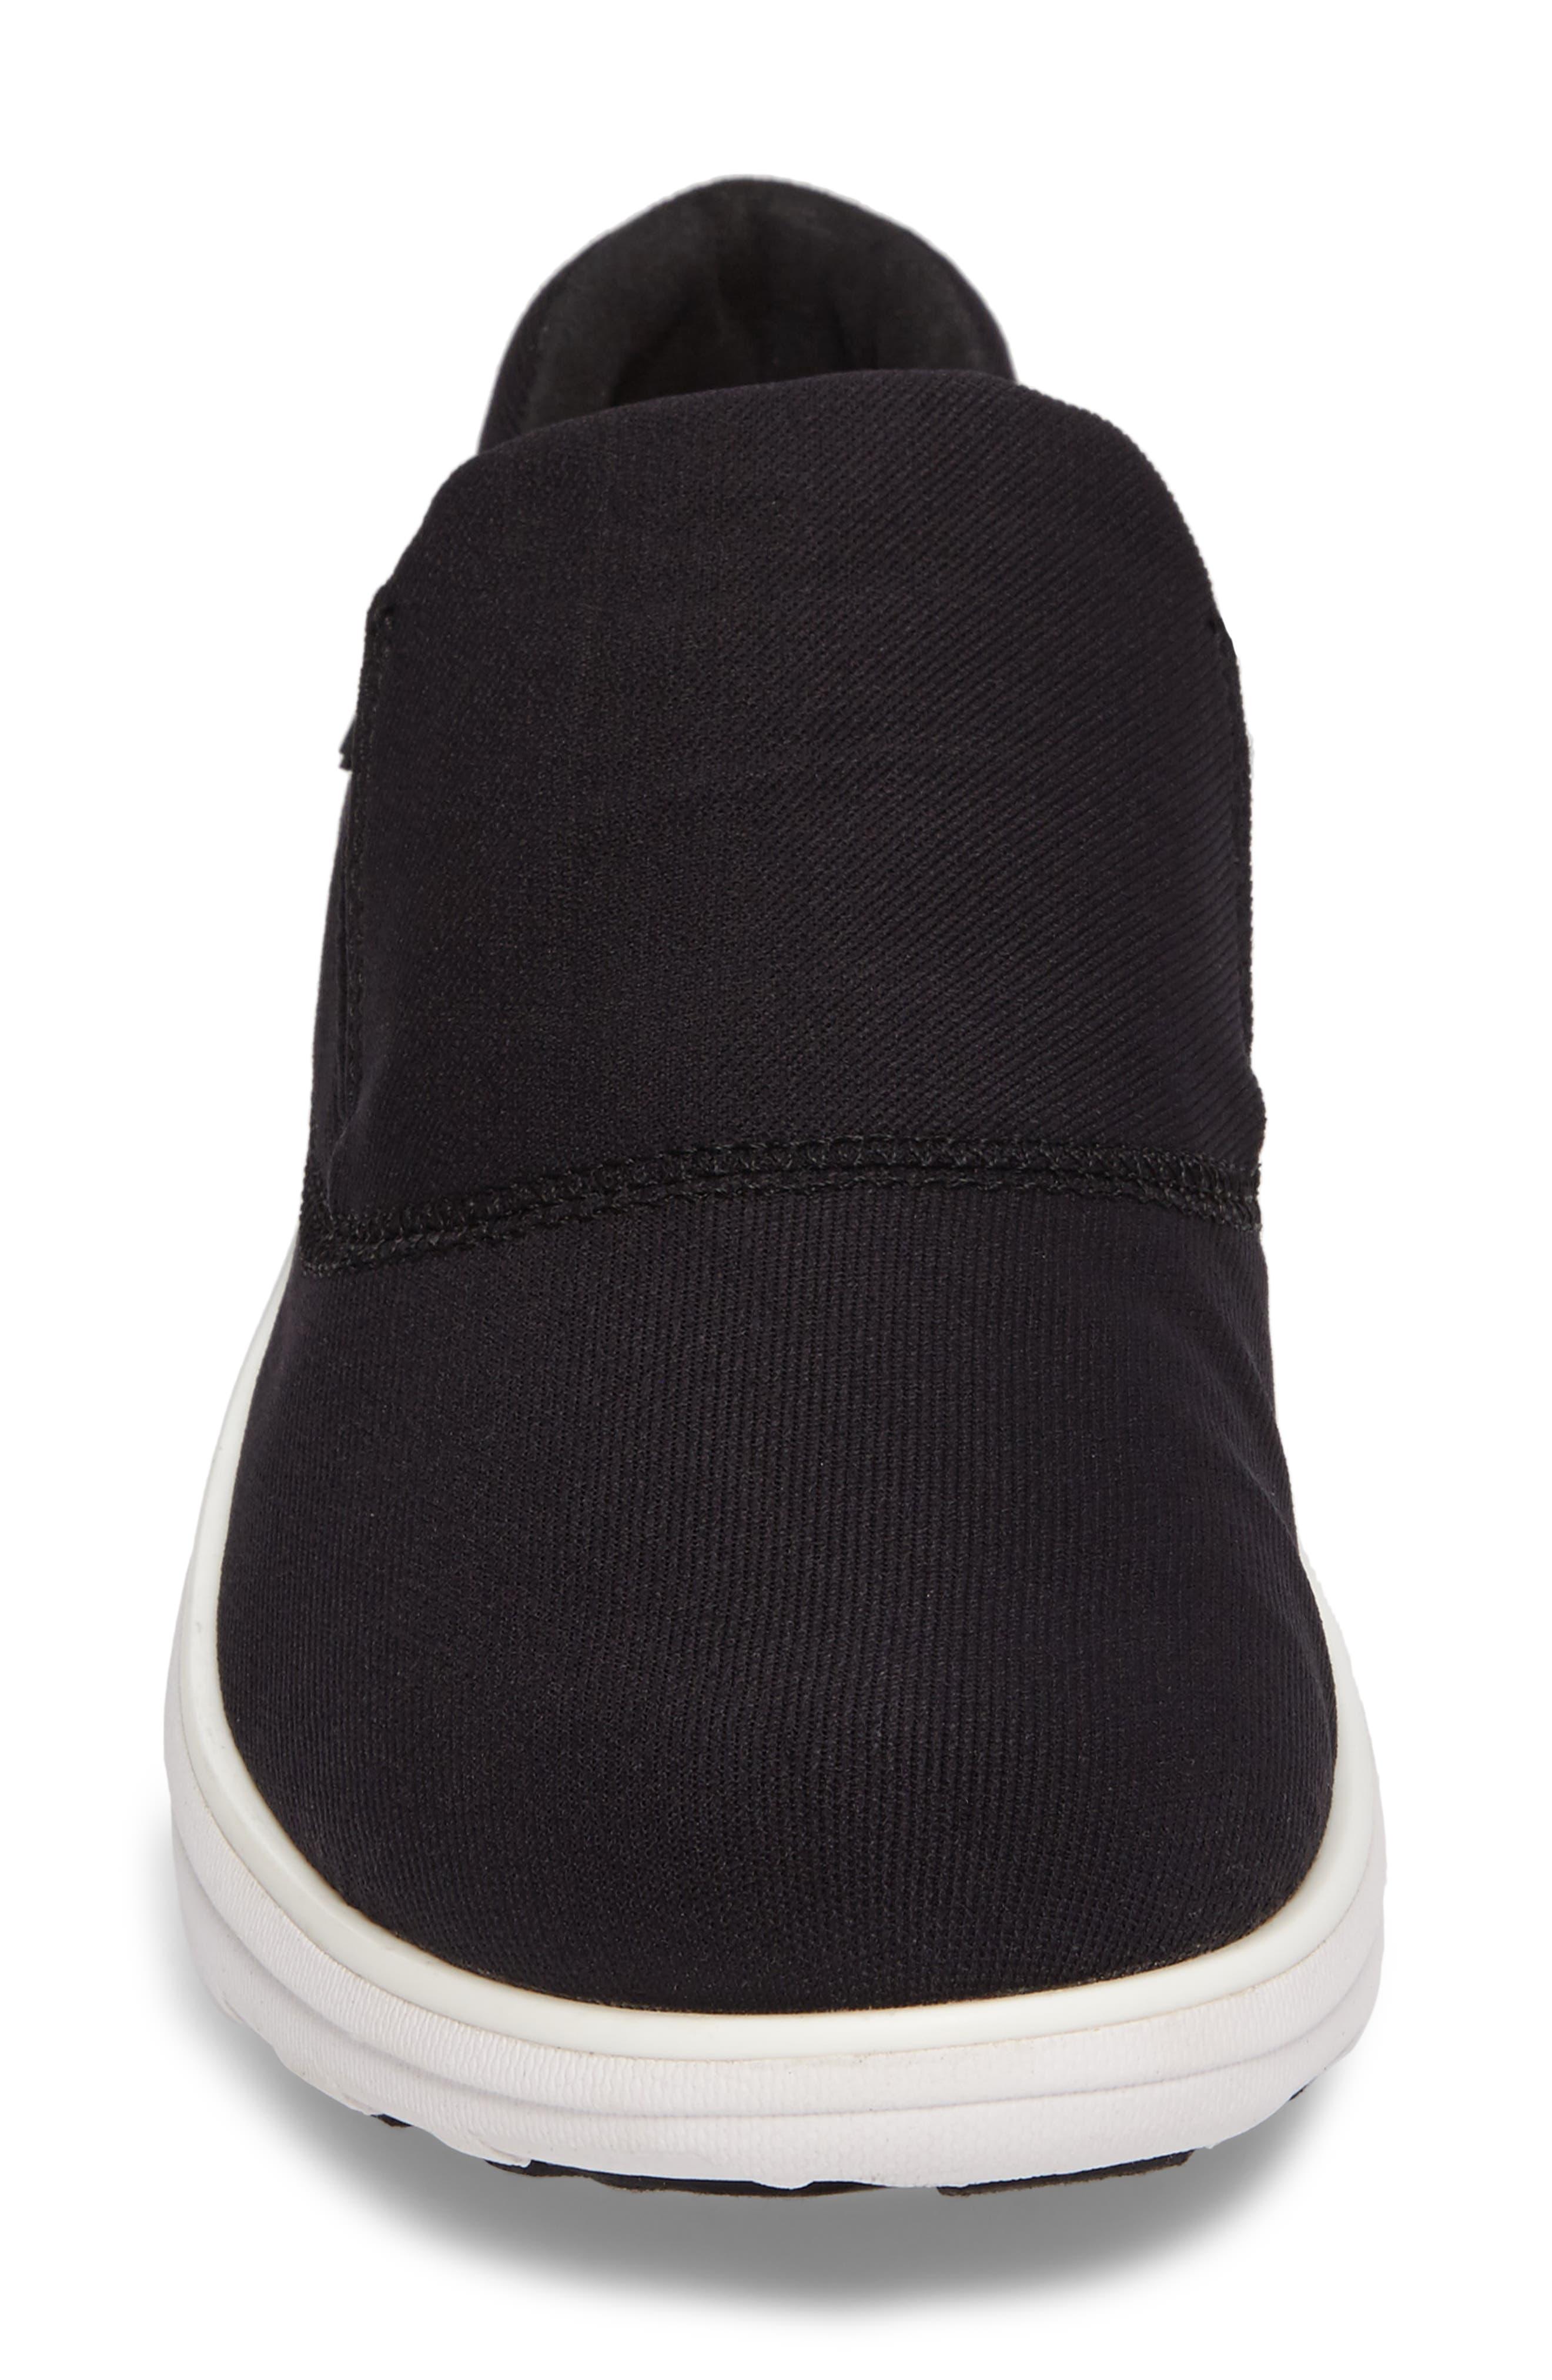 Alternate Image 4  - FitFlop Loaff Platform Slip-On Sneaker (Women)